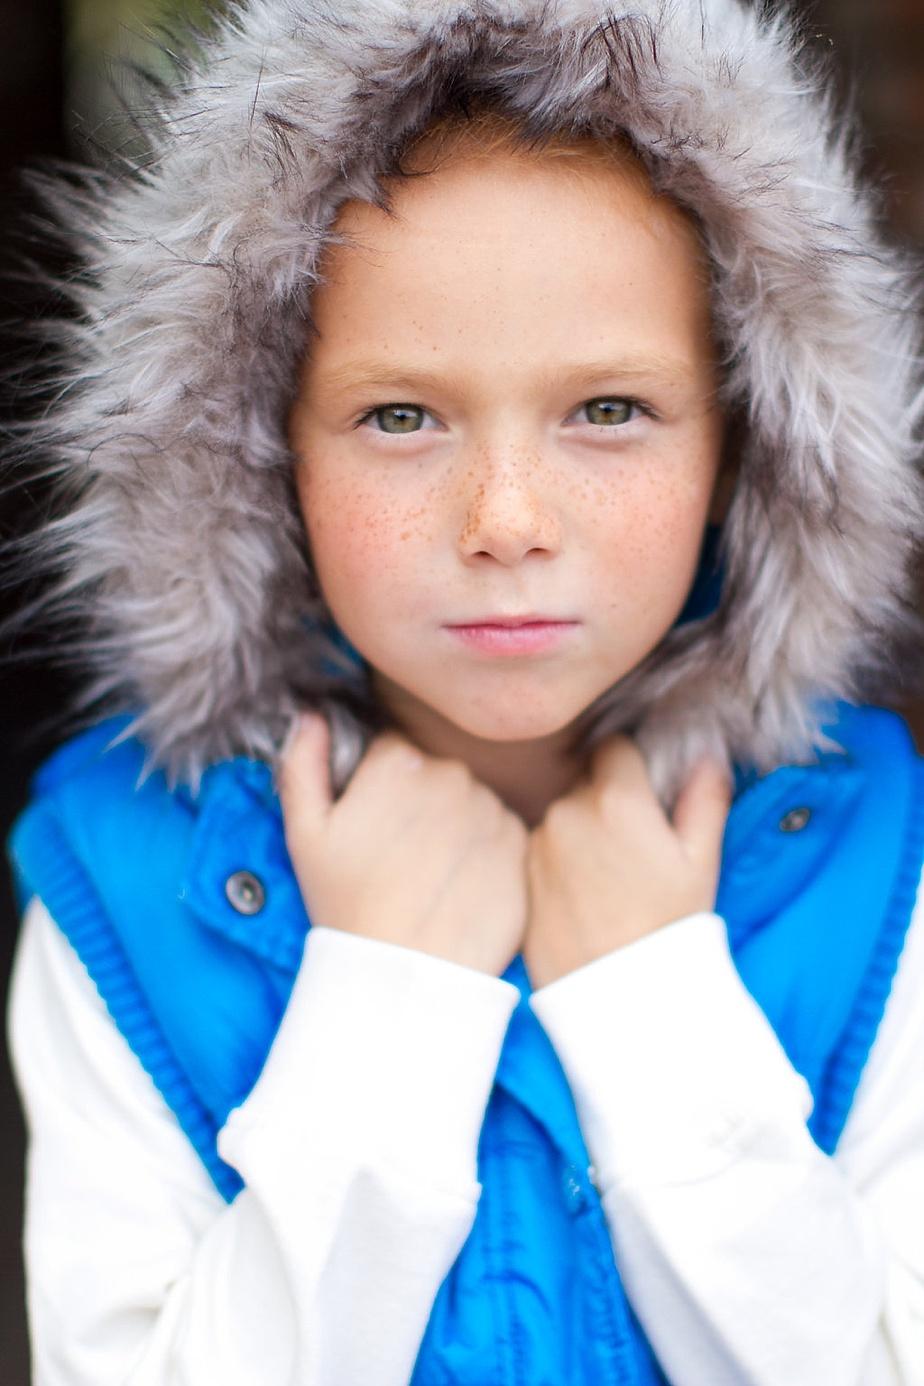 Children-Headshot-Photographer_0021